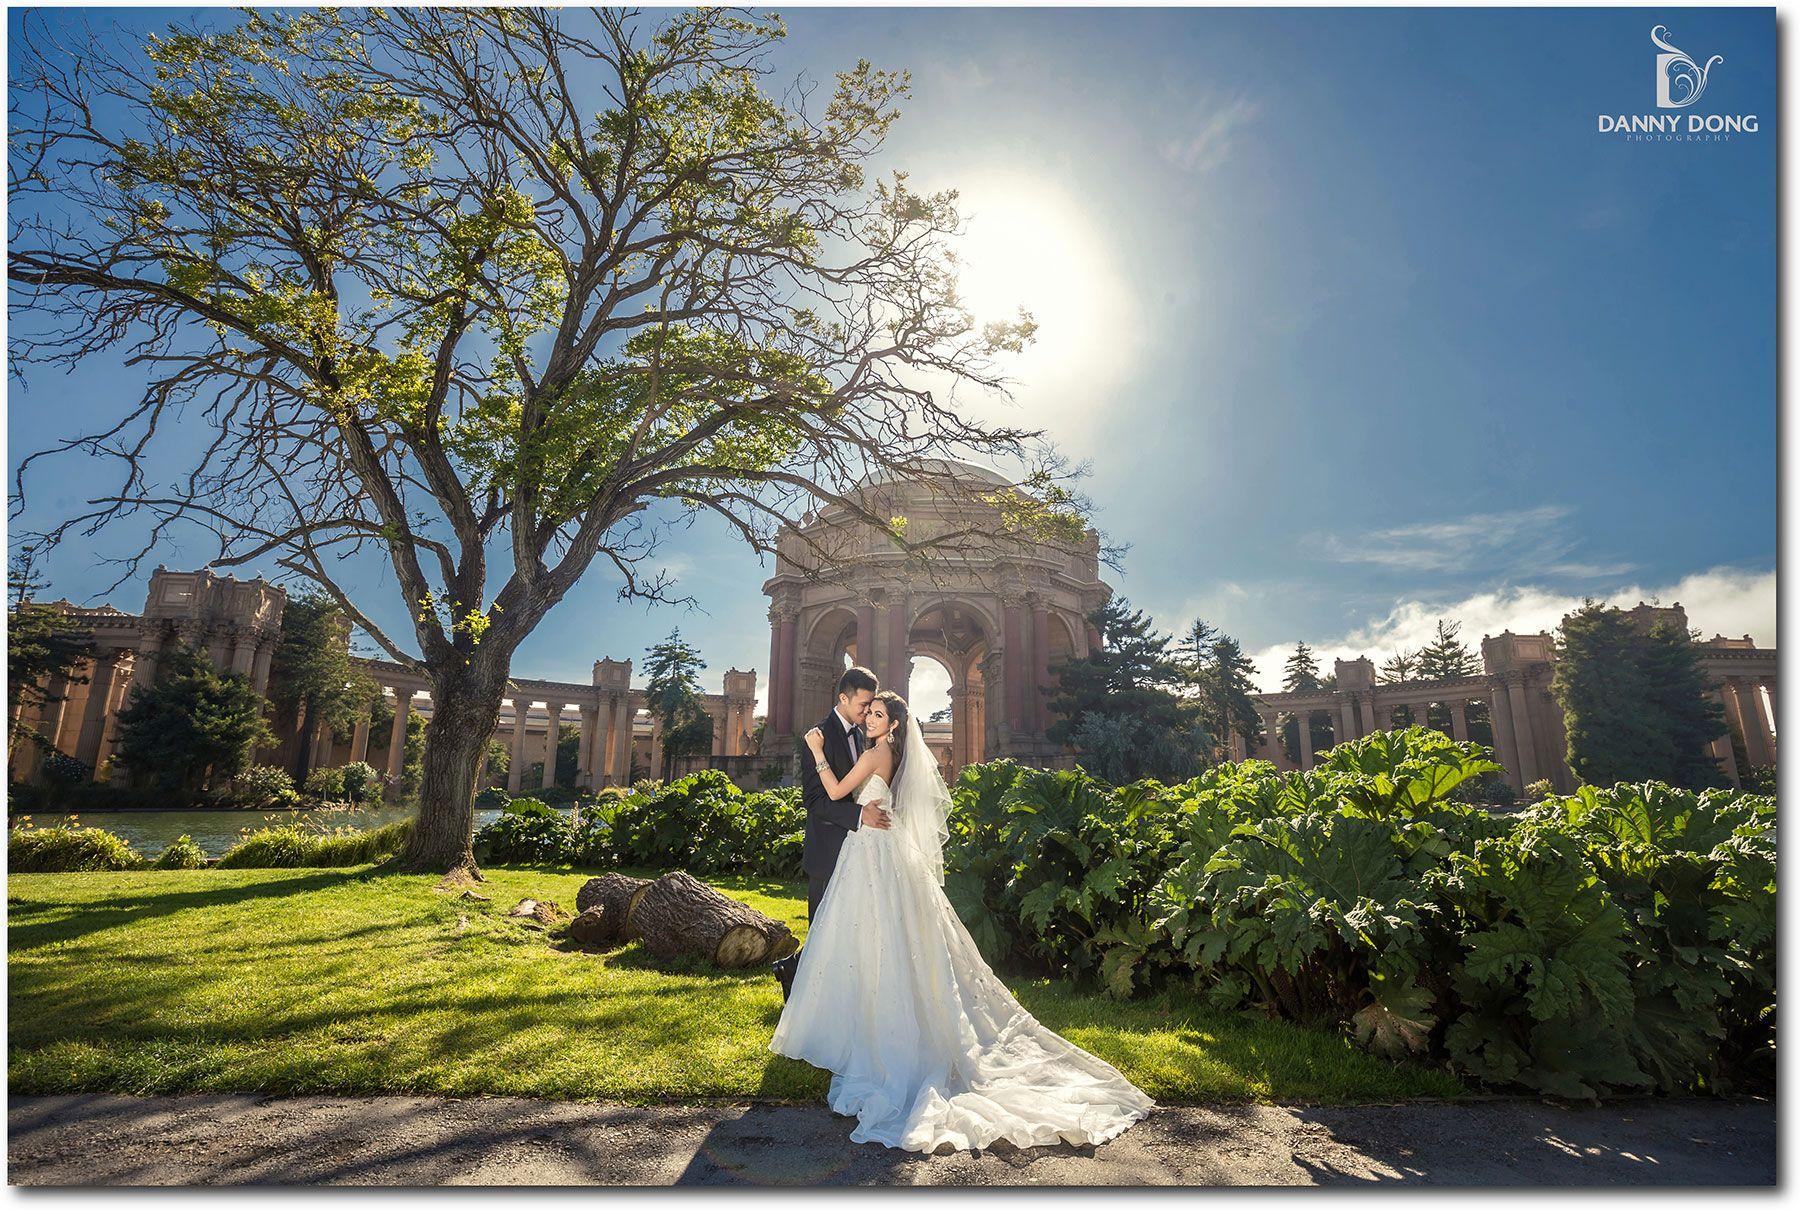 Danny Dong international award winning wedding photographer is